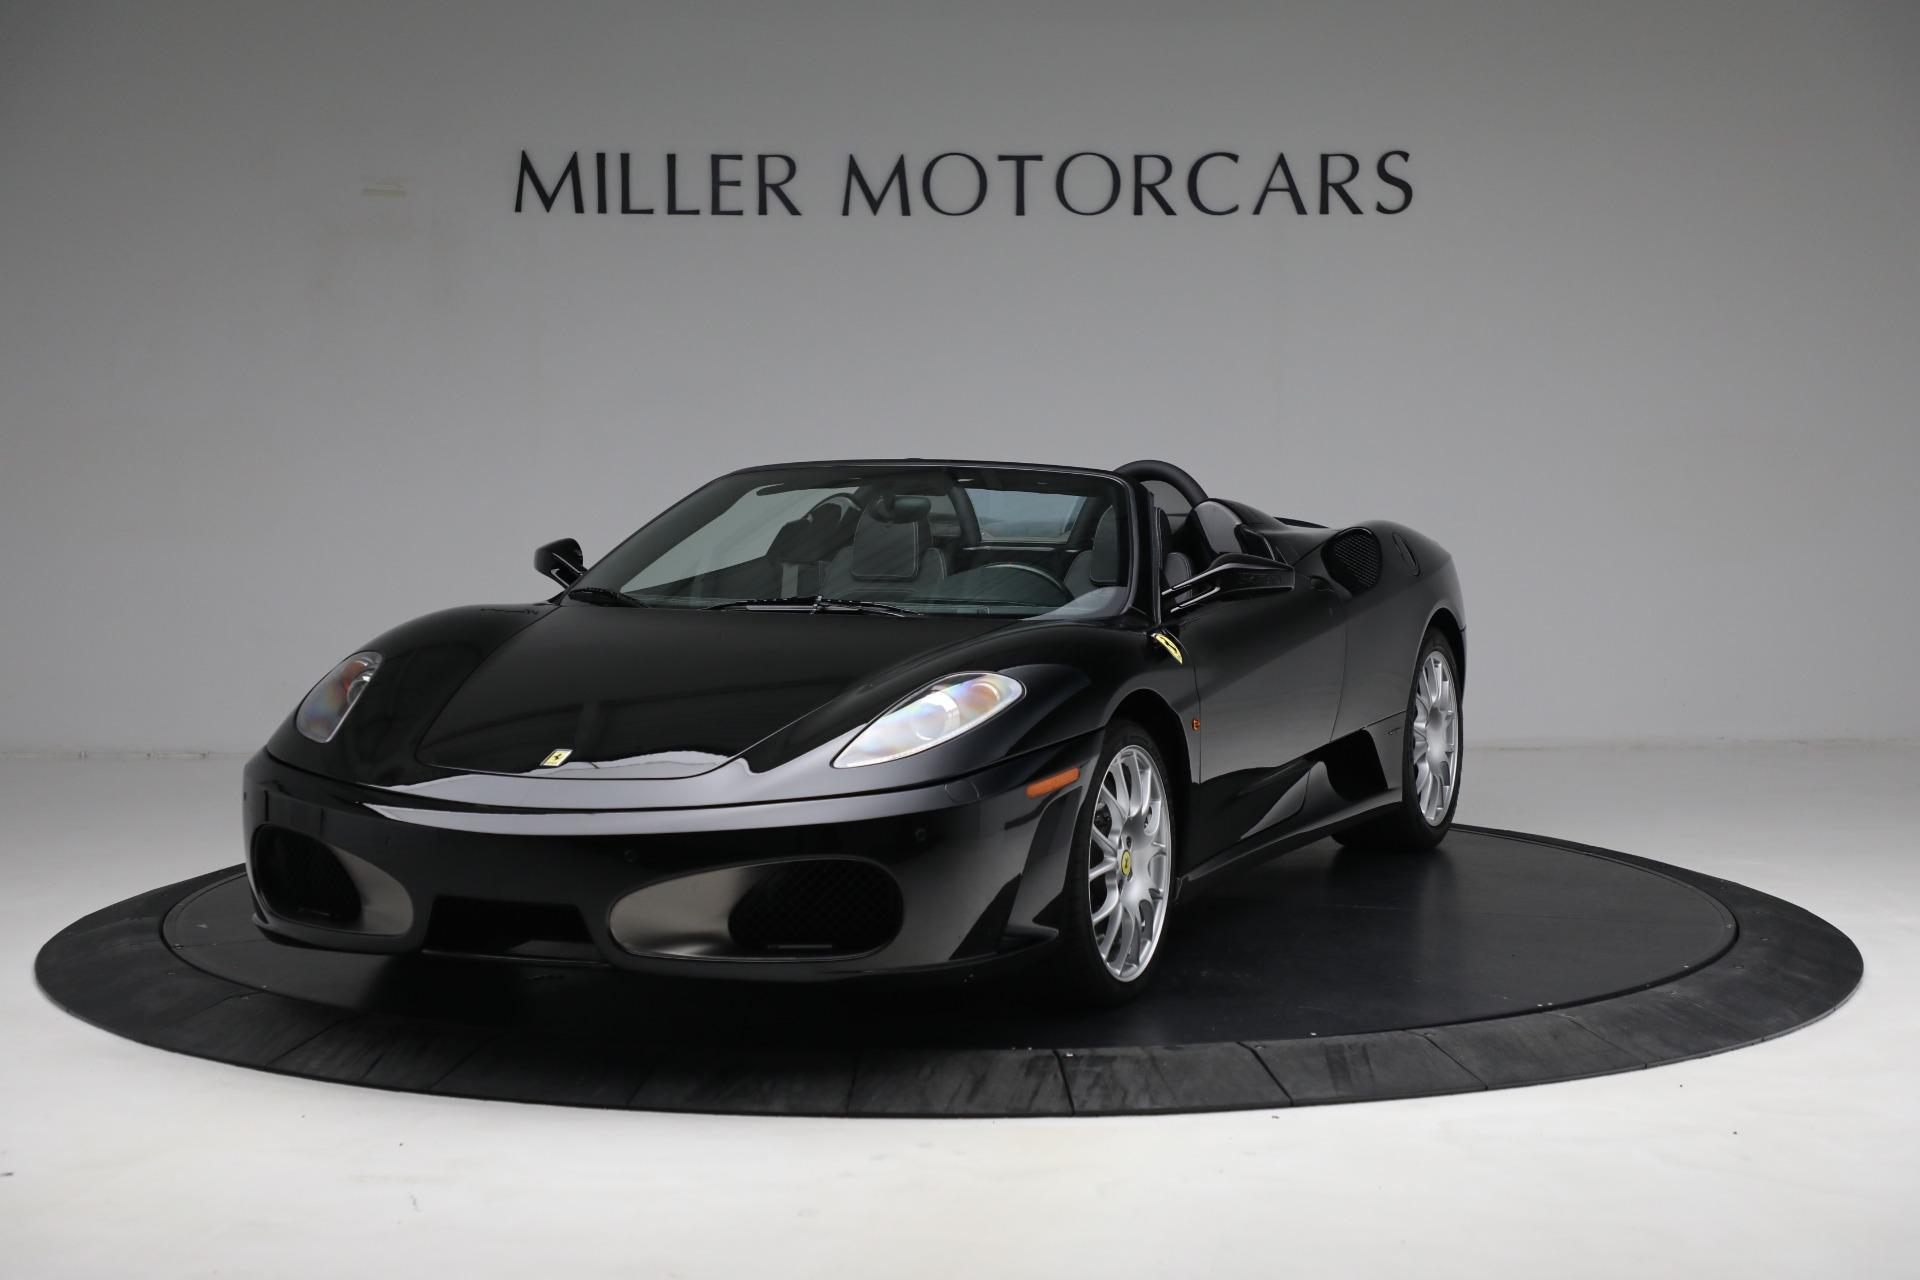 Used 2008 Ferrari F430 Spider for sale $159,900 at McLaren Greenwich in Greenwich CT 06830 1